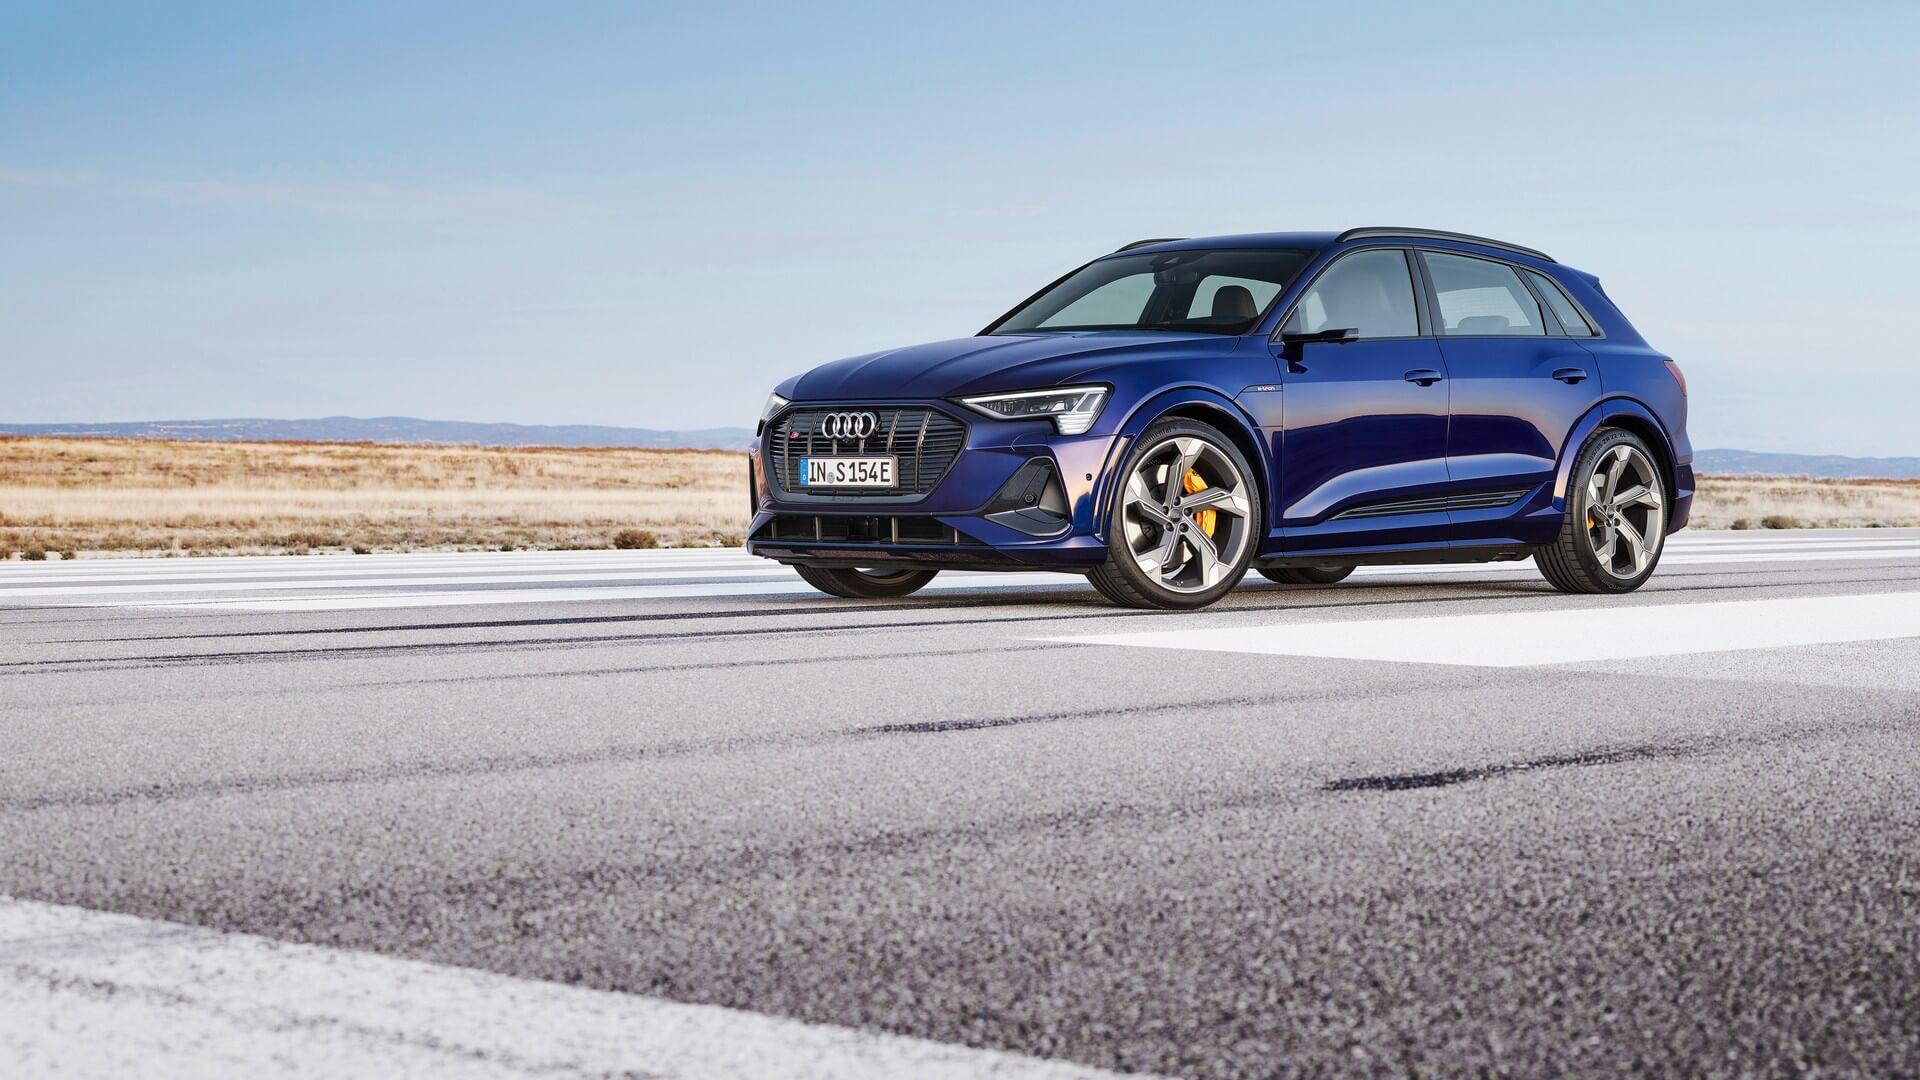 Audi-E-Tron-S-and-E-Tron-S-Sportback-2020-34